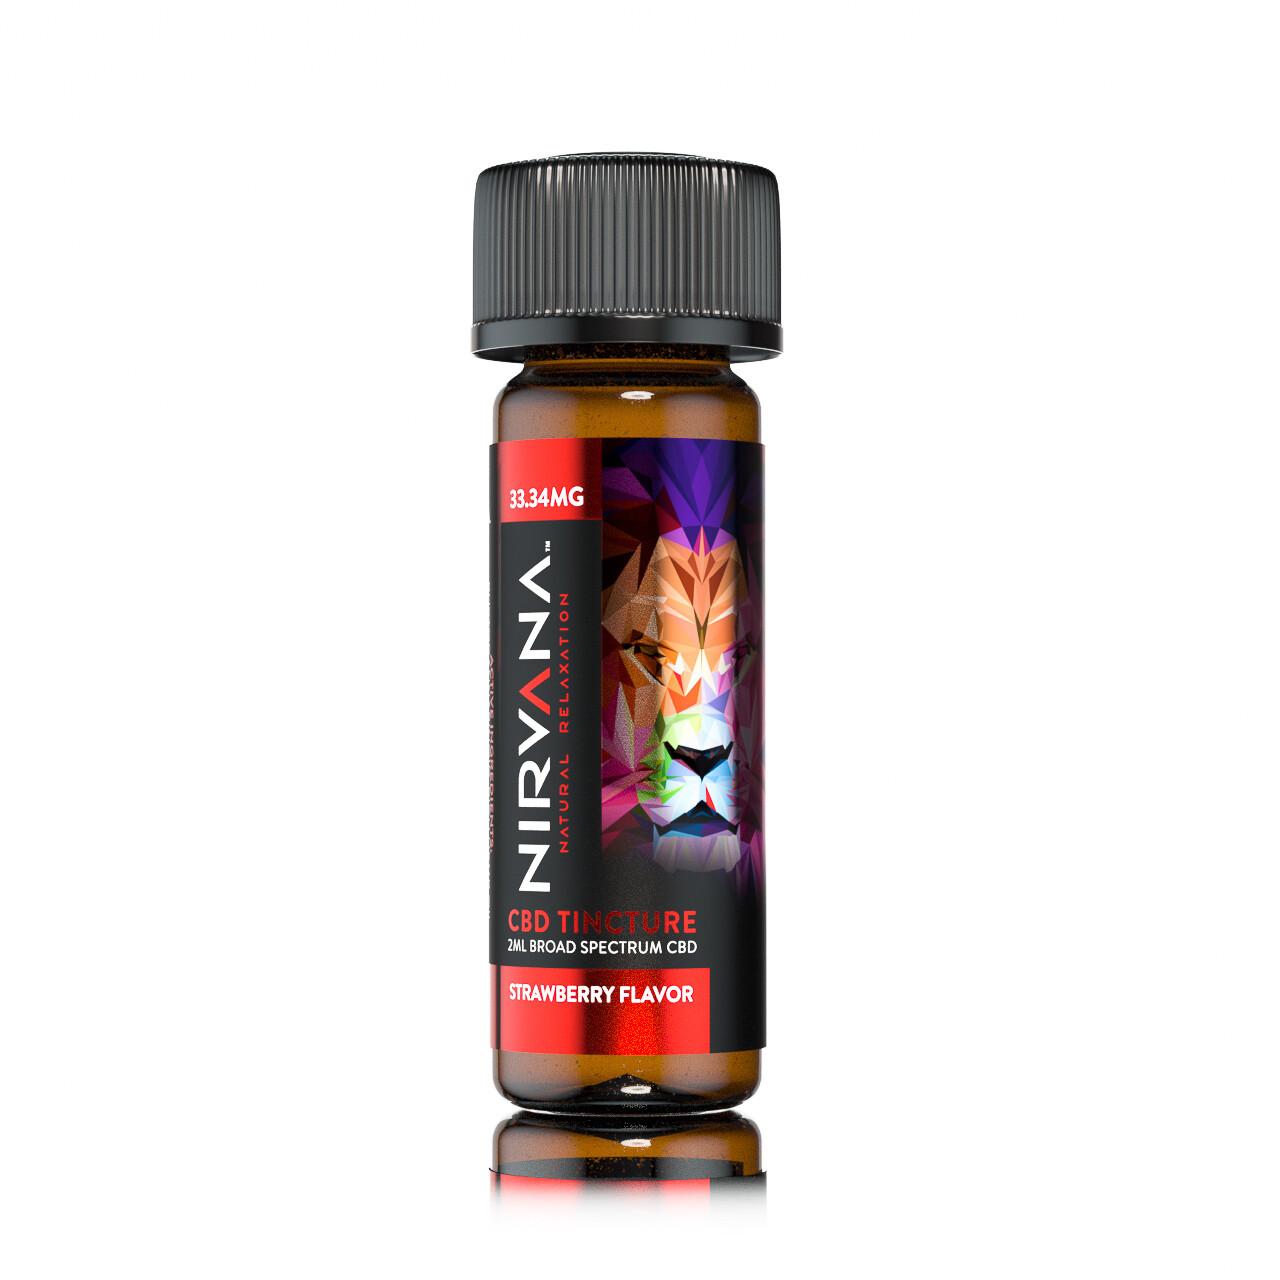 NIRVANA Strawberry 33mg Broad Spectrum Shot (2ml bottle)